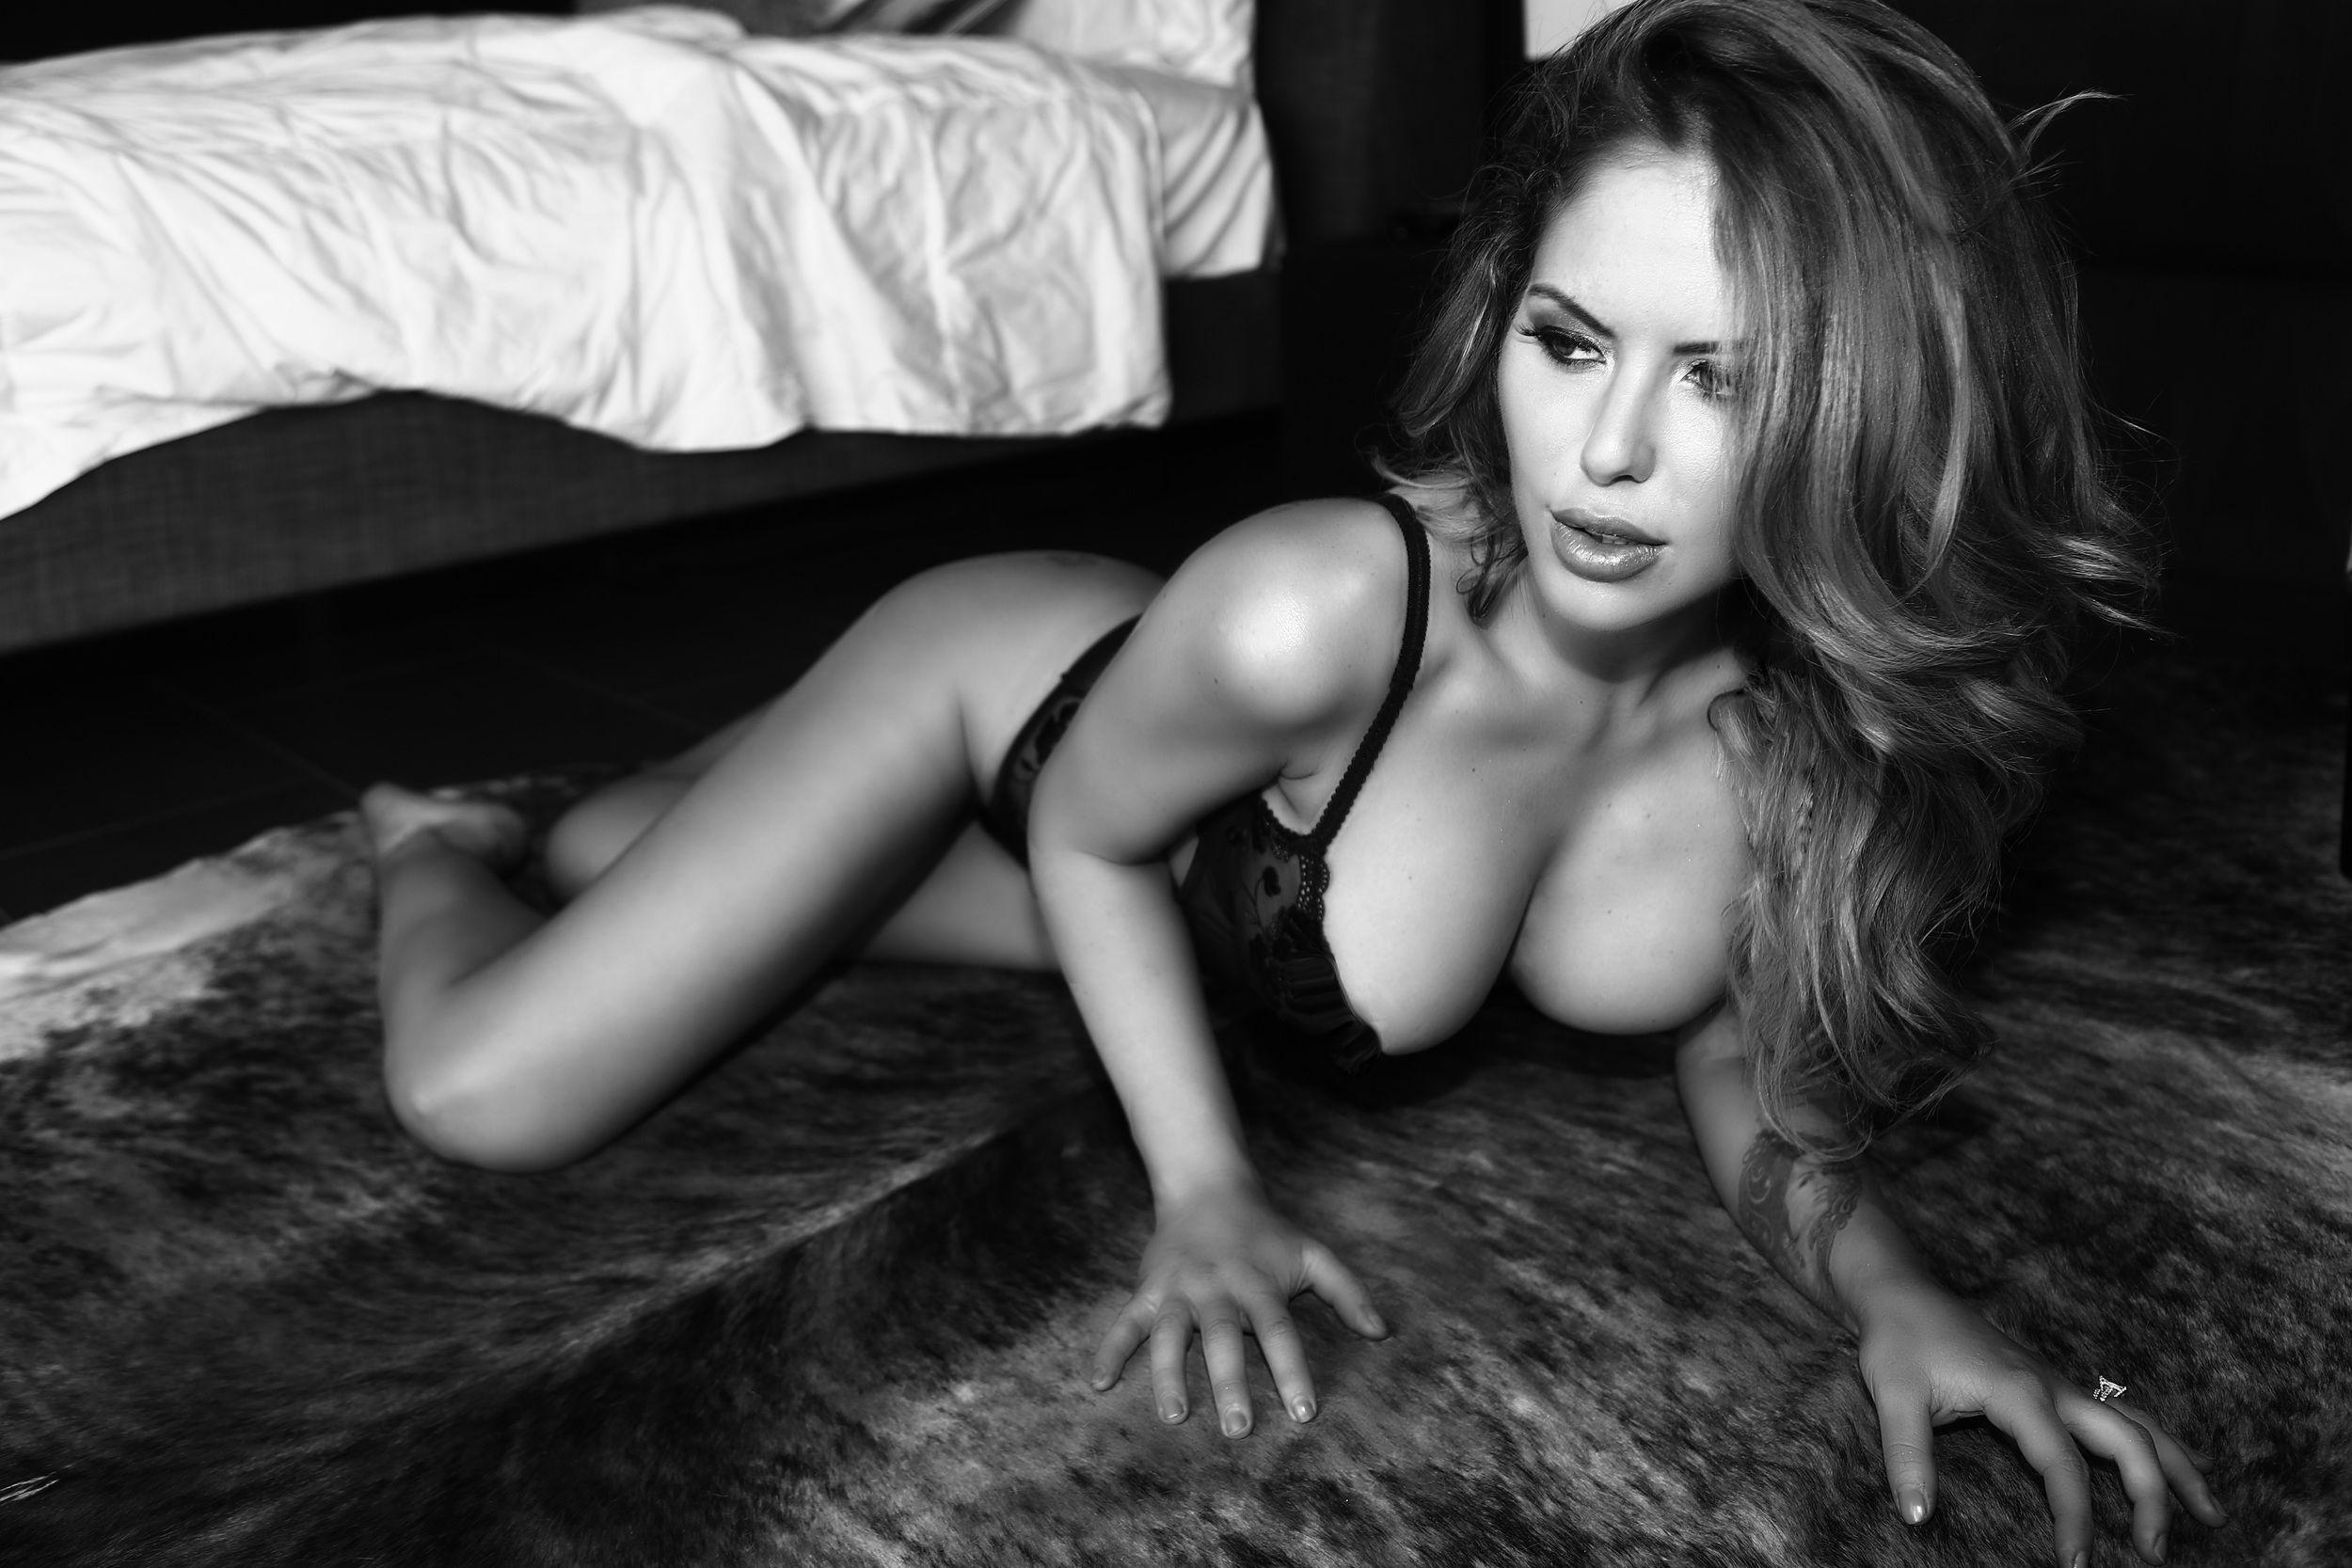 Brittney-Palmer-Sexy-9.jpg